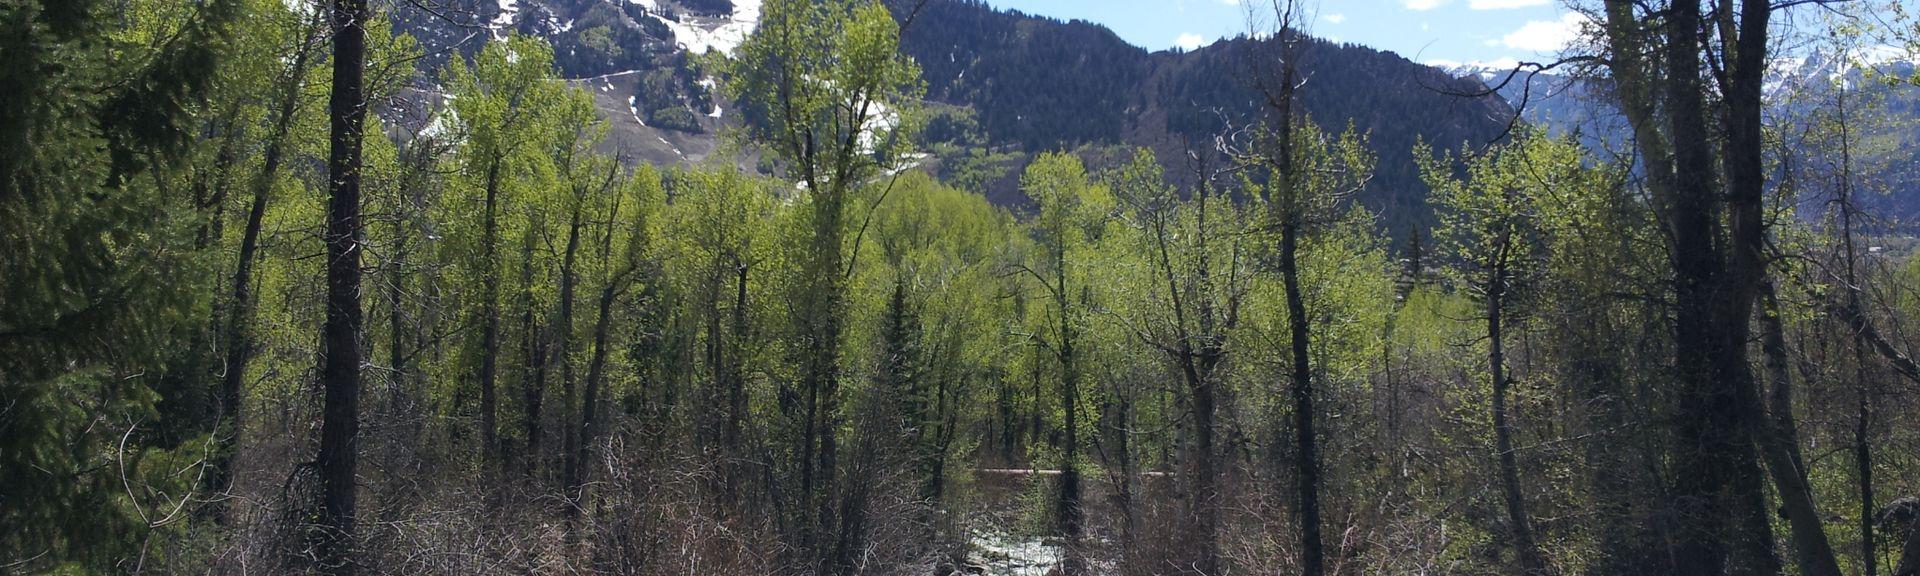 Aspen Mountain, Aspen, Colorado, United States of America